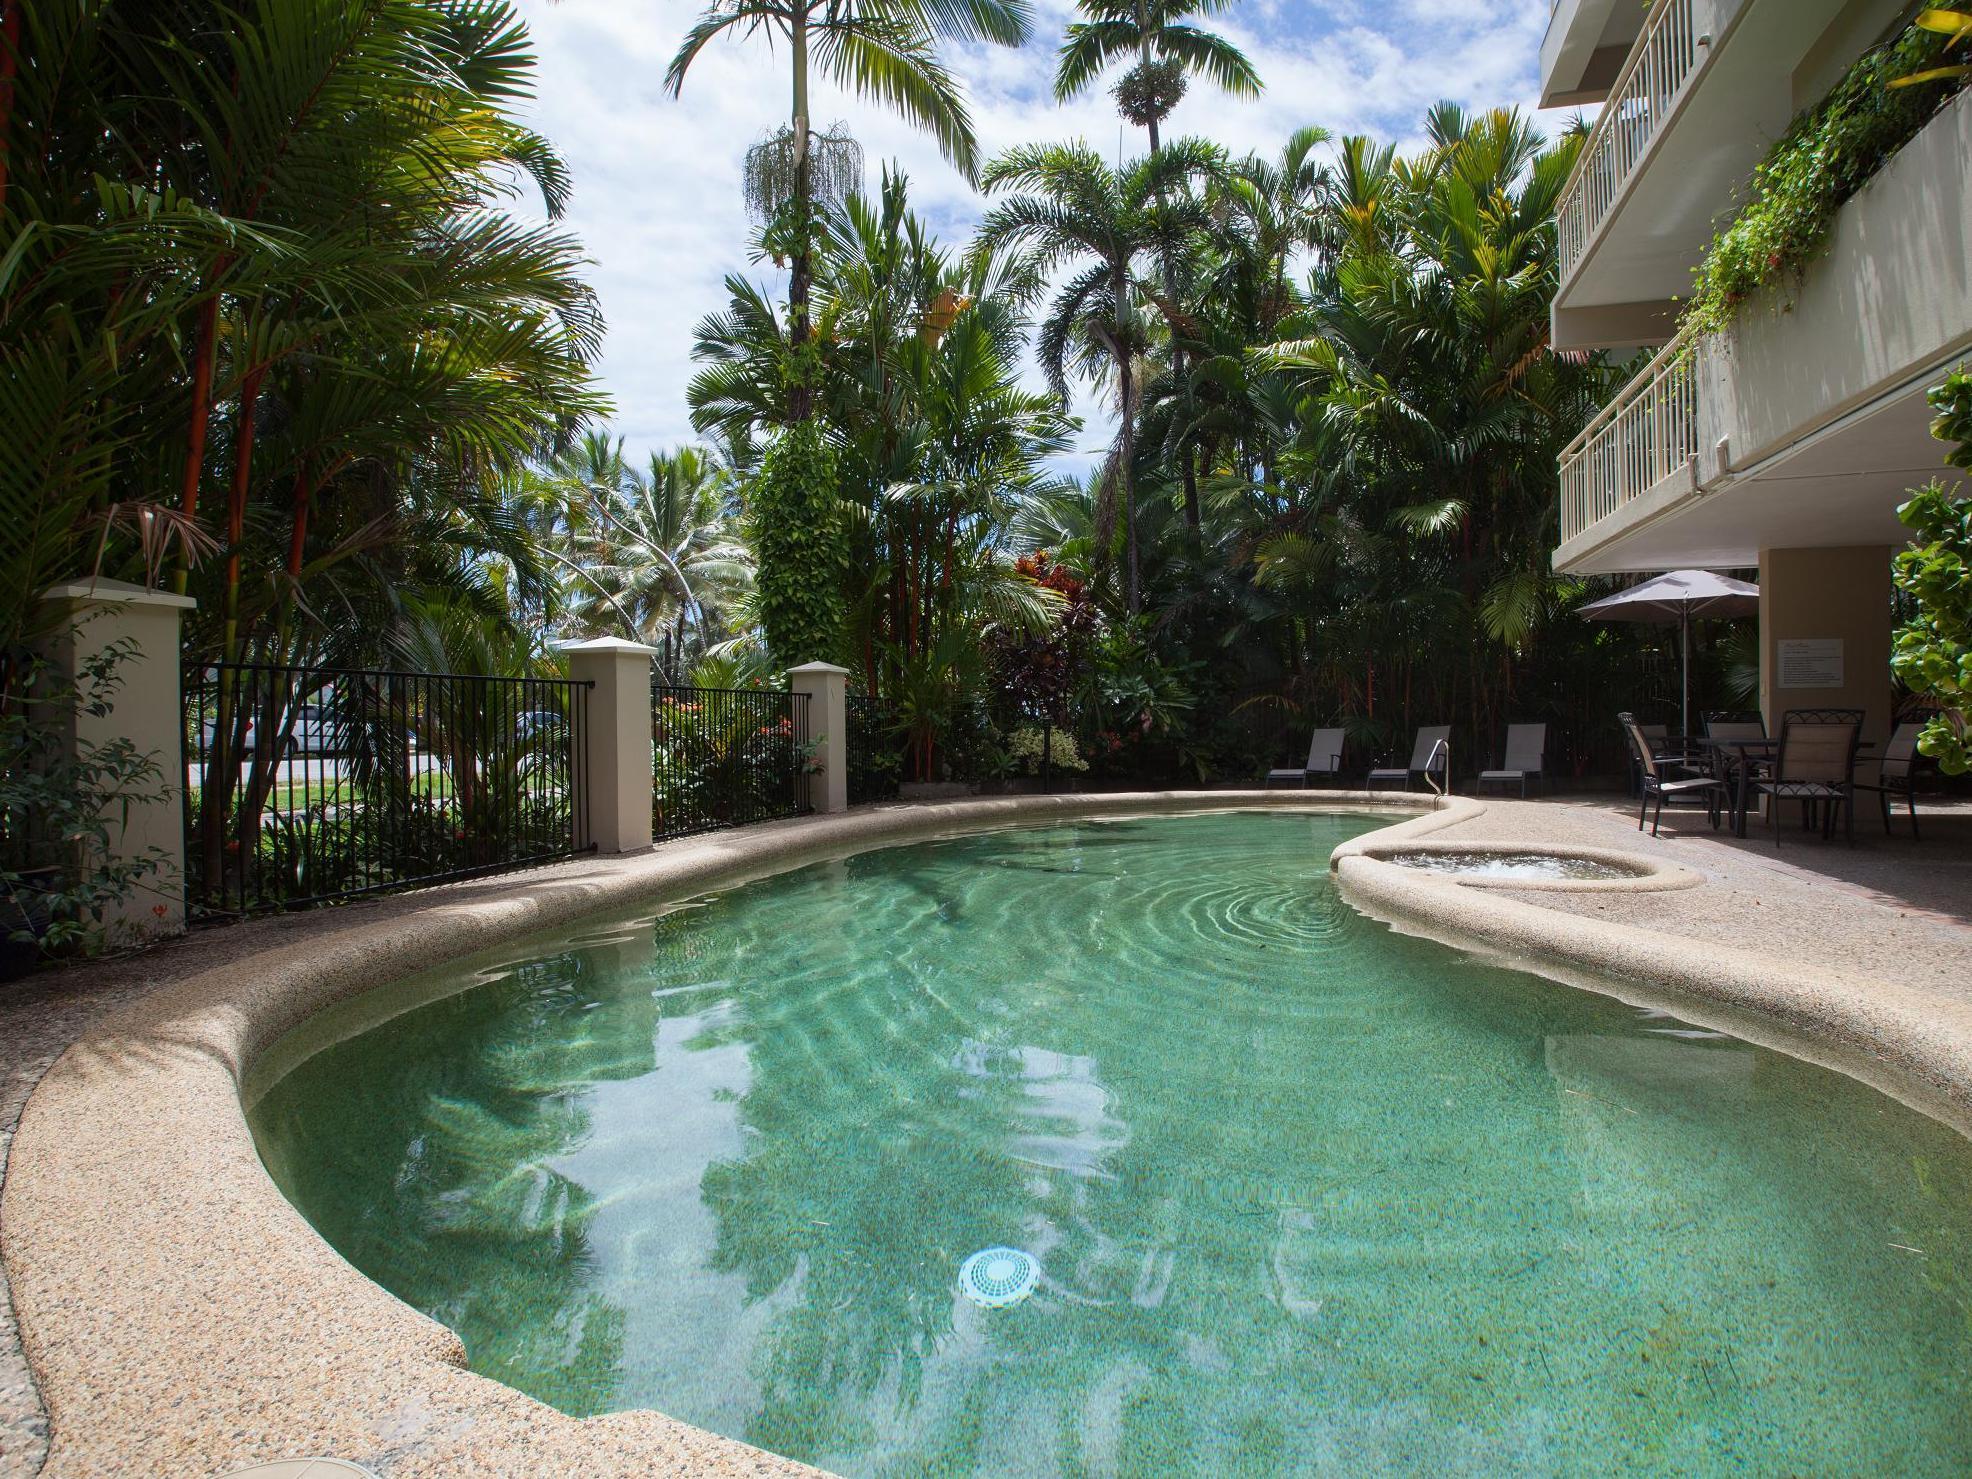 Seascape Holidays - Driftwood Mantaray Apartment 5 - Hotell och Boende i Australien , Port Douglas